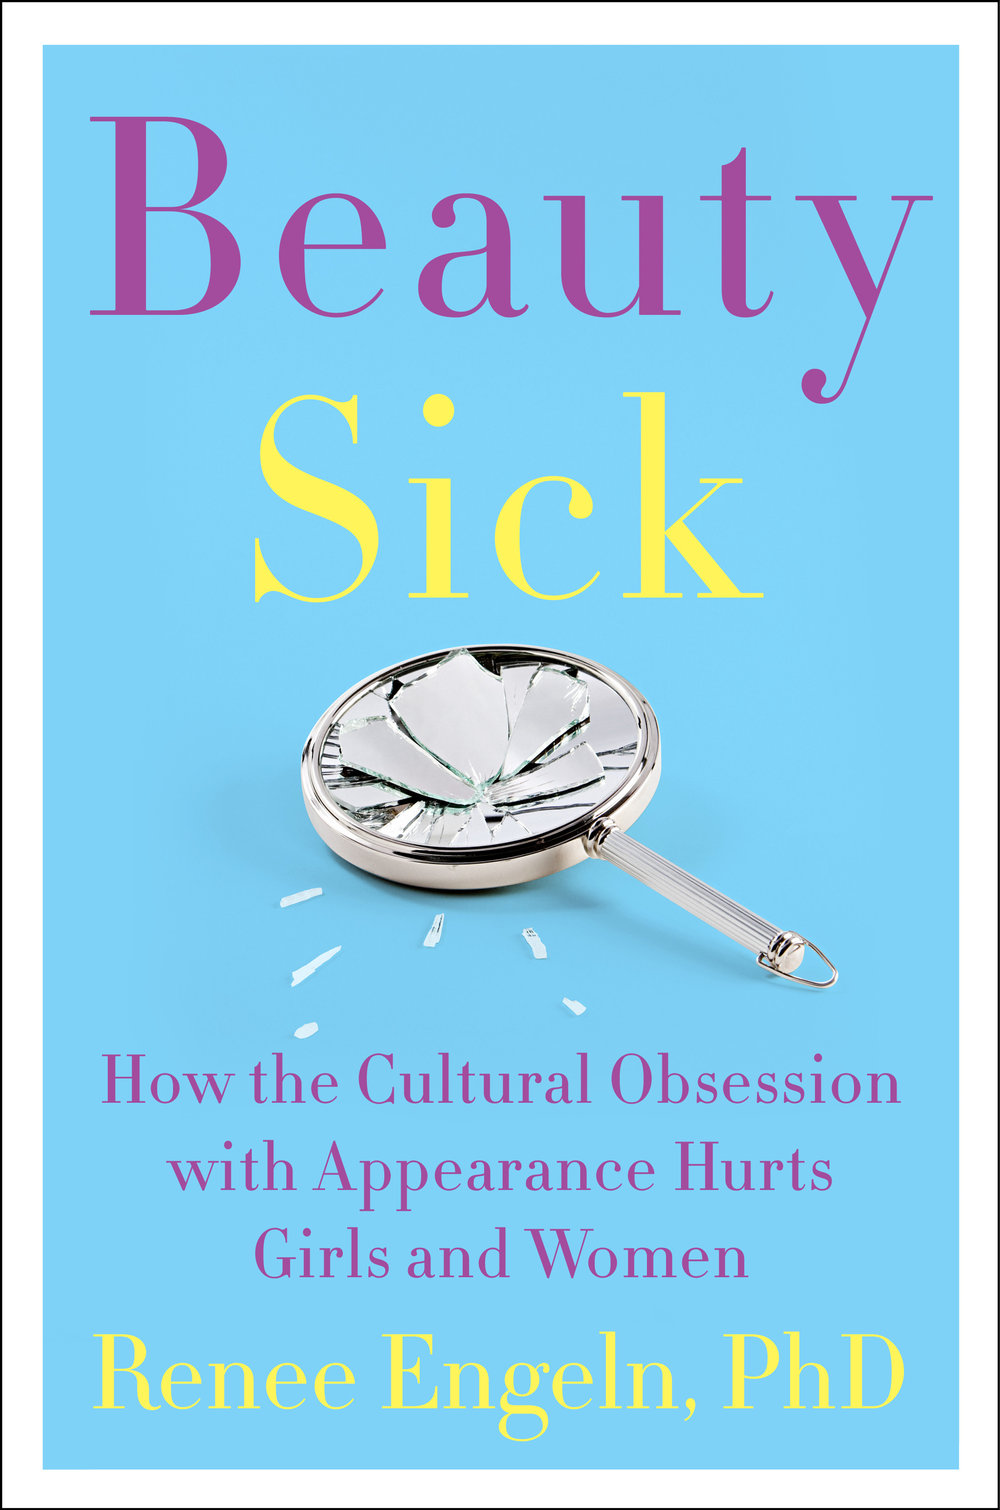 Beauty Sick cover (1).jpg